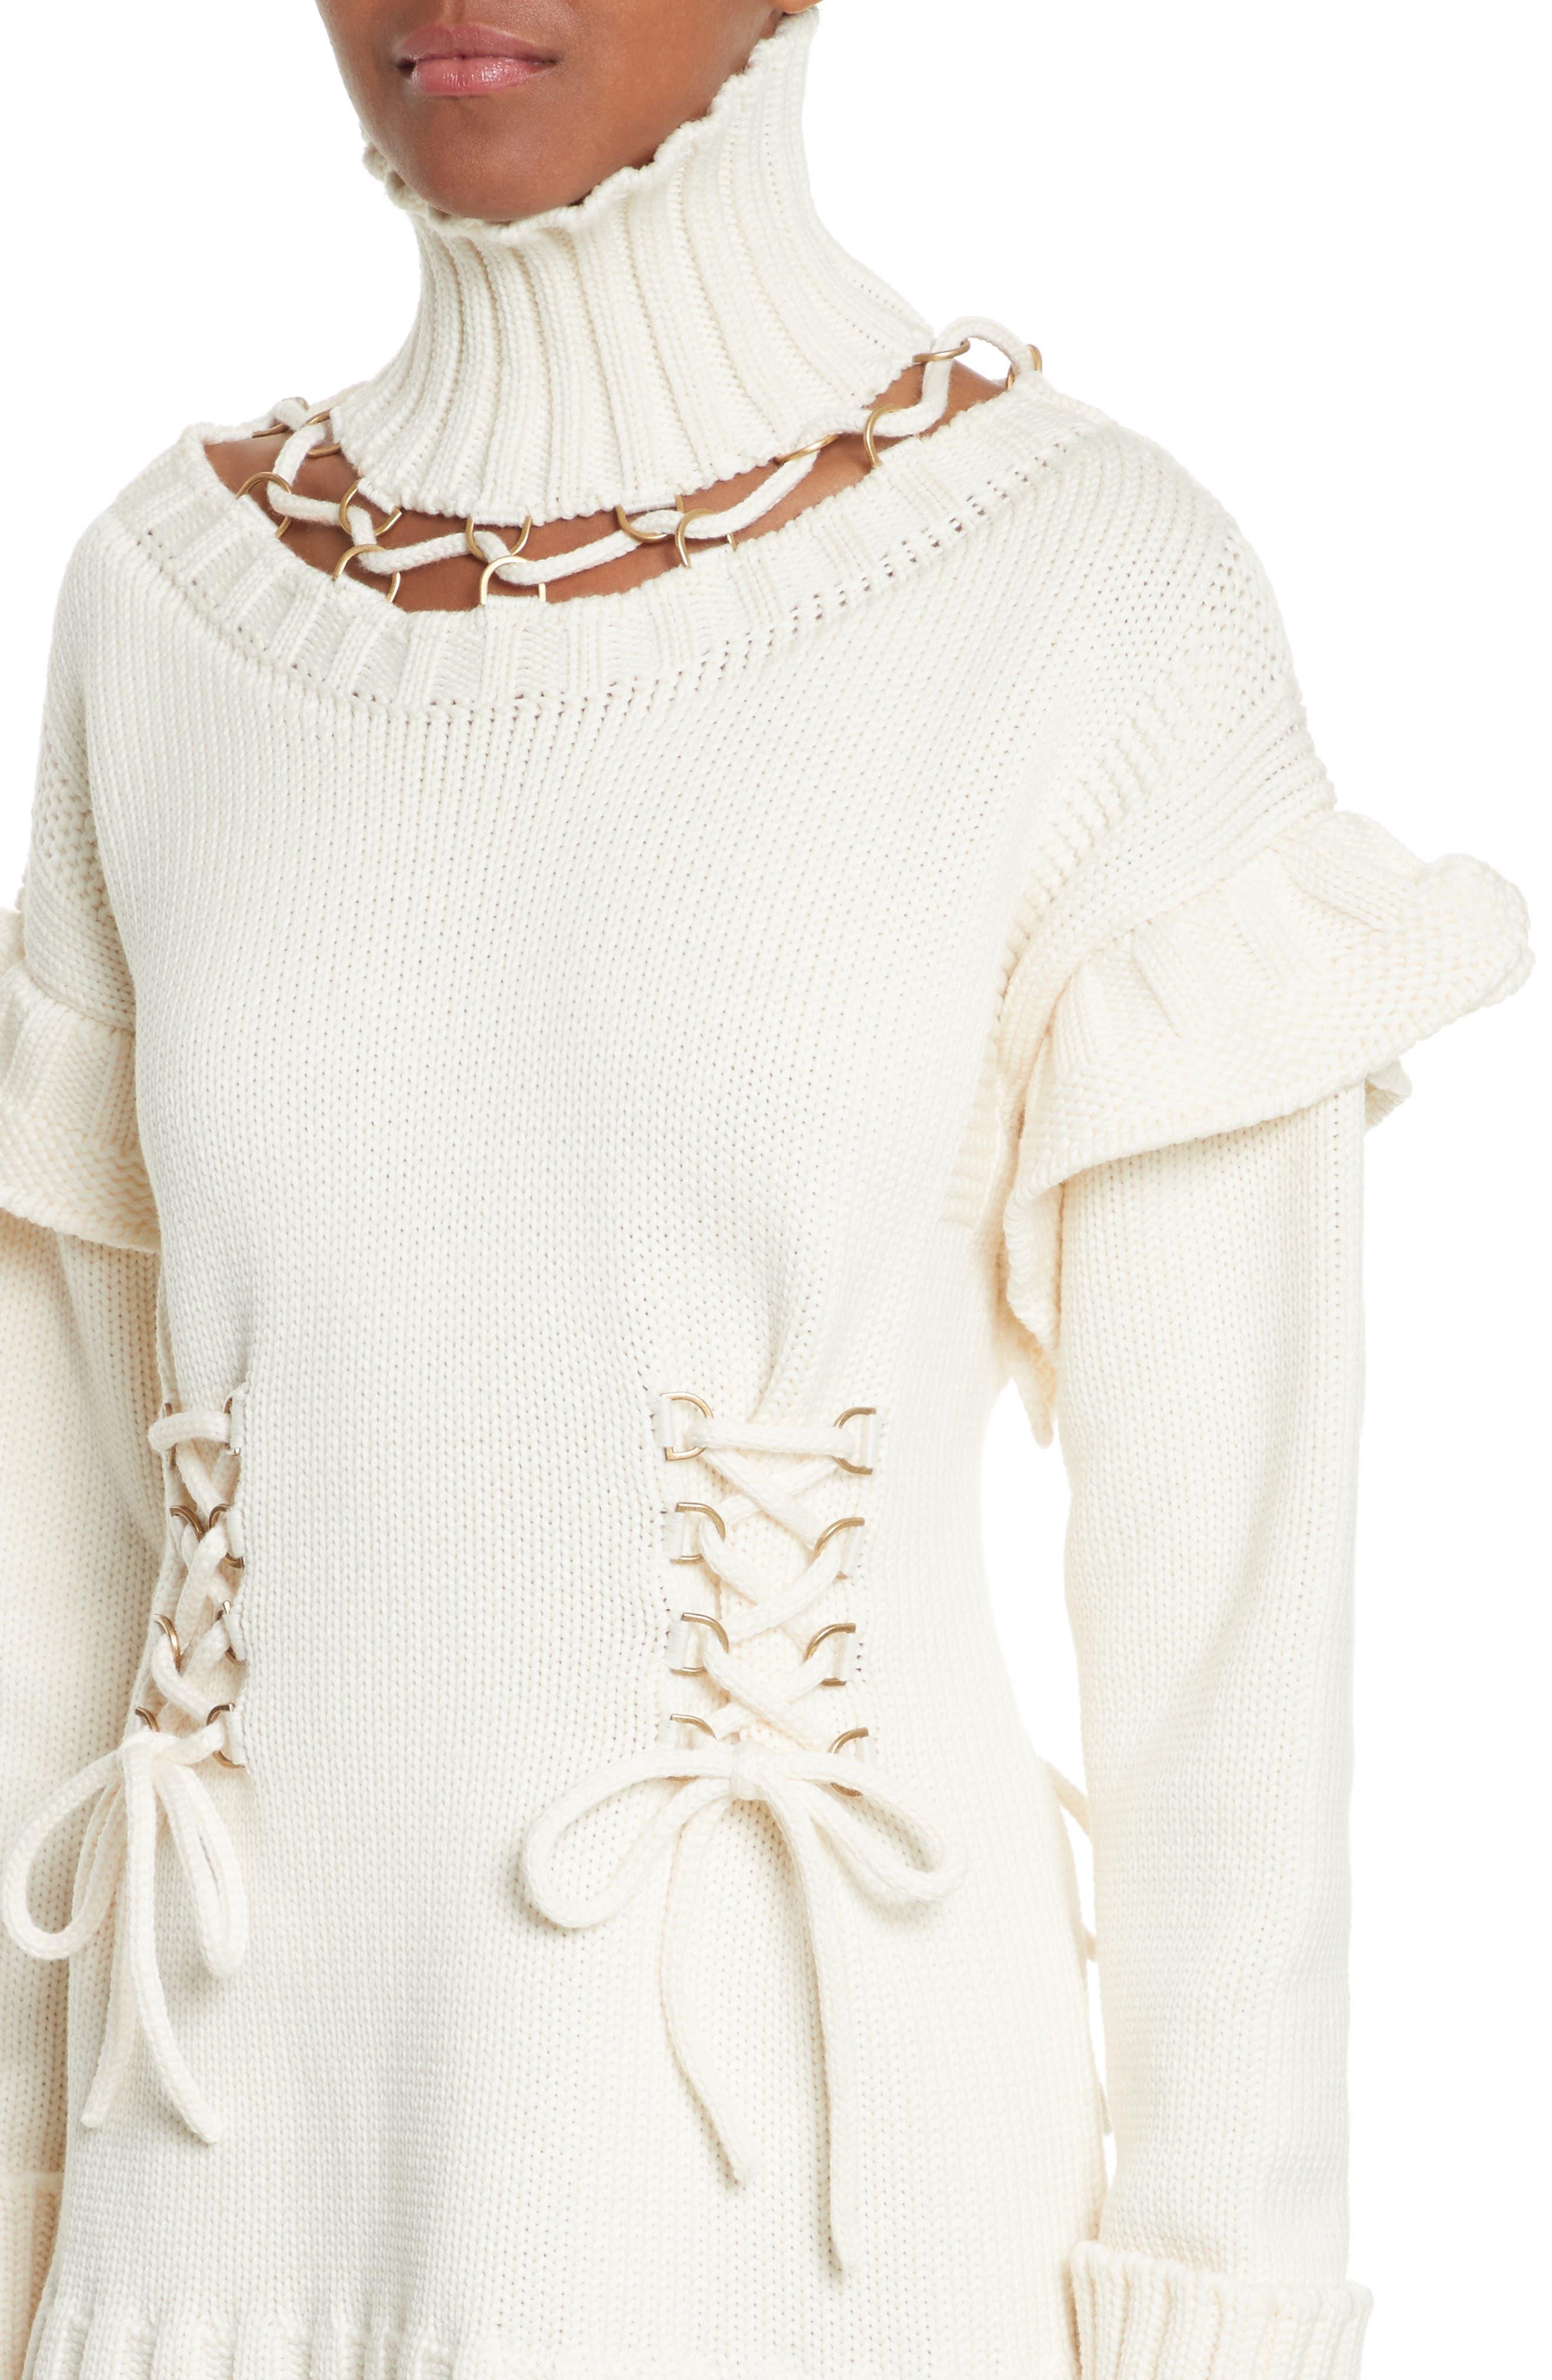 Lace-Up Turtleneck Sweater Dress,                             Alternate thumbnail 4, color,                             Ivory